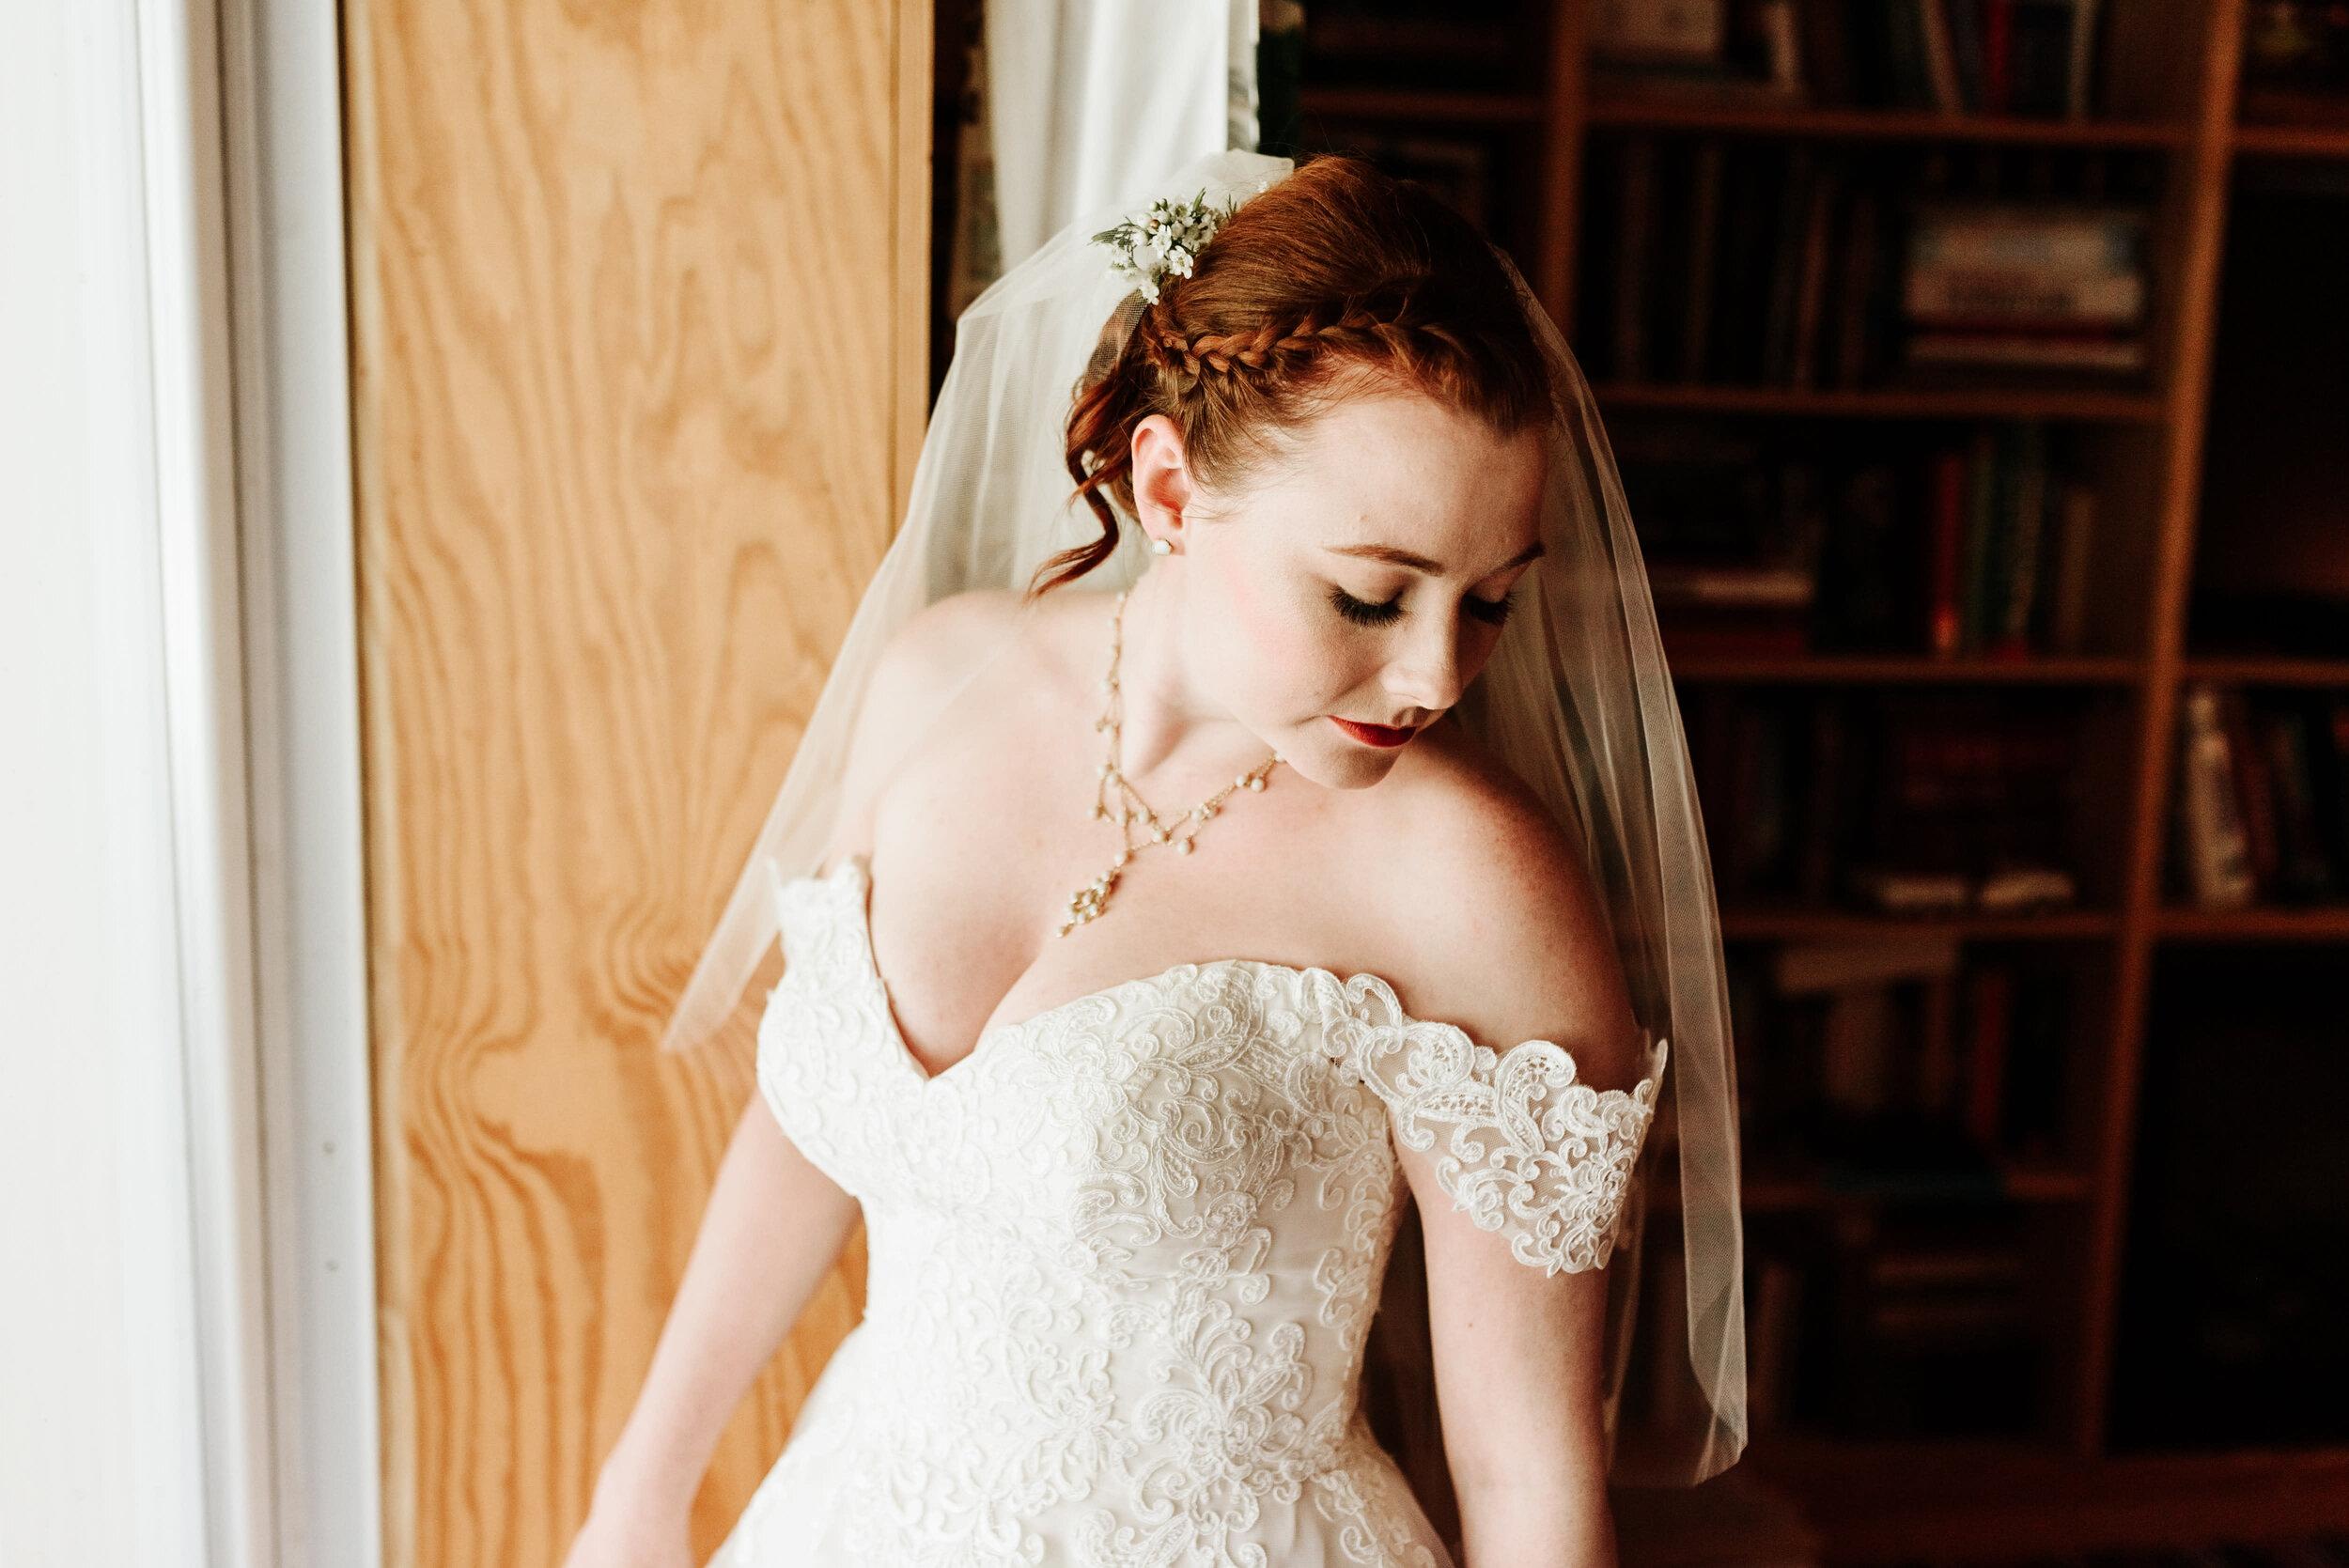 Rachel_David_Wedding_Richmond_Virginia_Photography_by_V_9.jpg